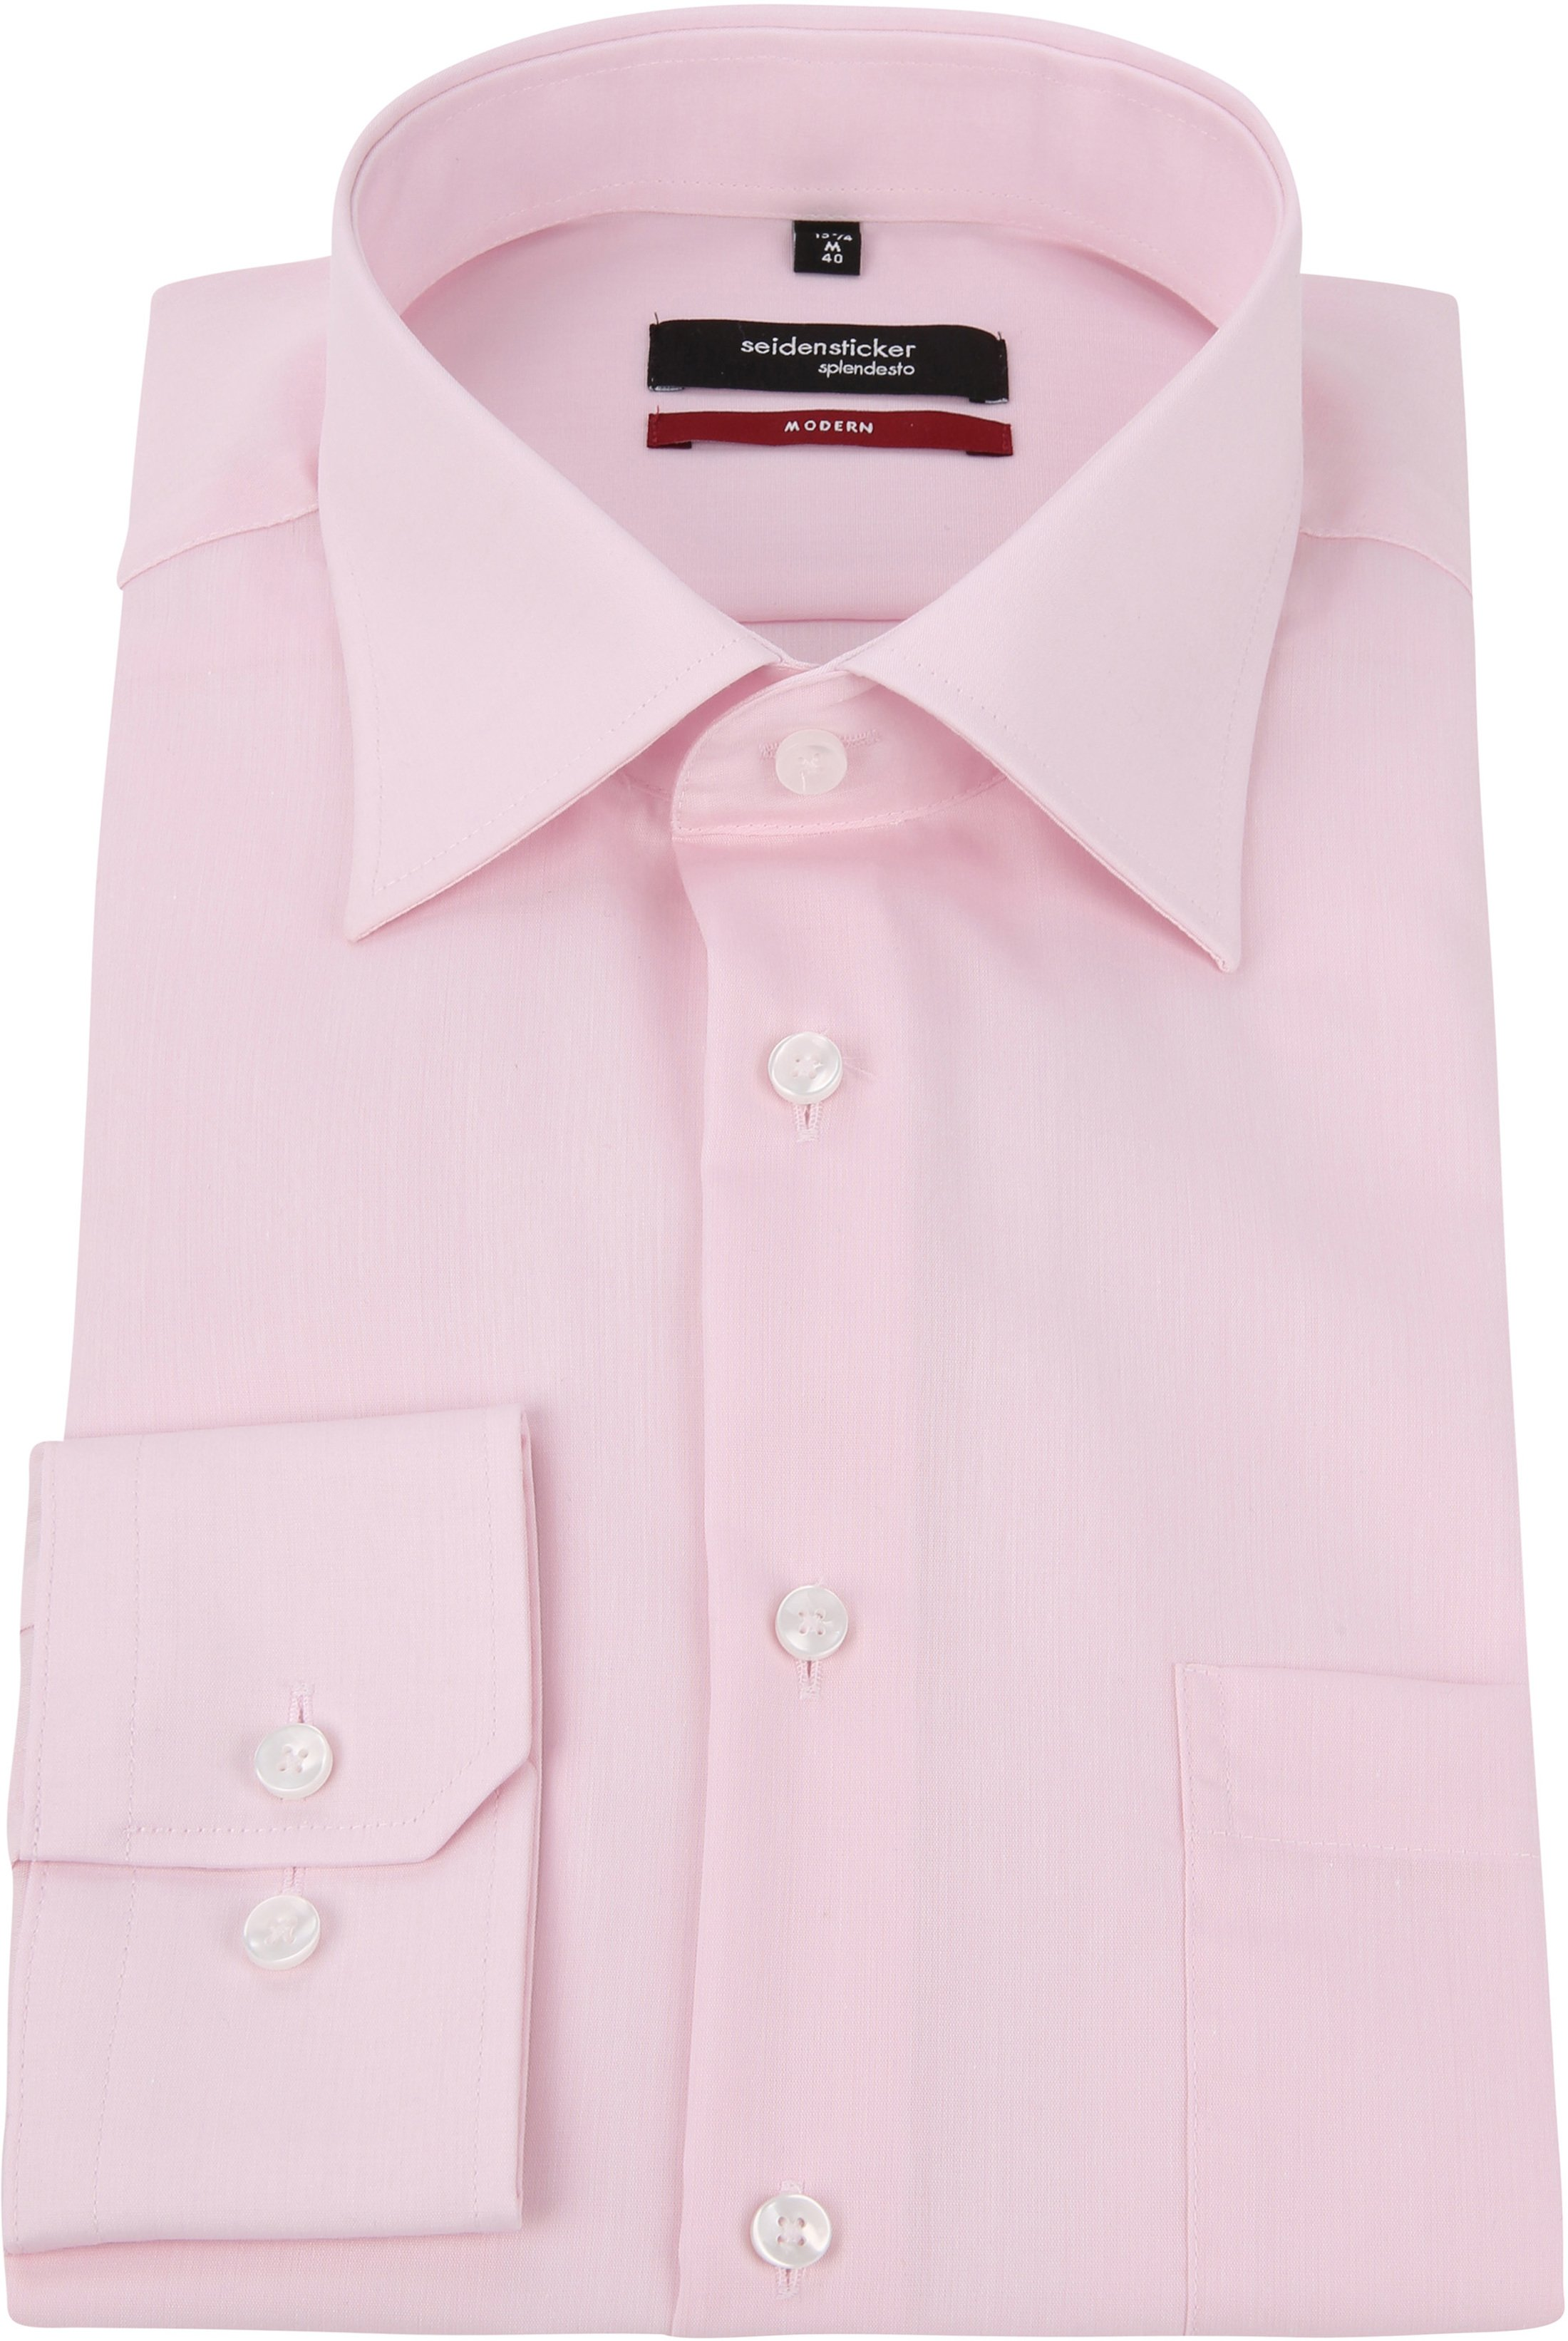 Seidensticker Splendesto Shirt Roze photo 2